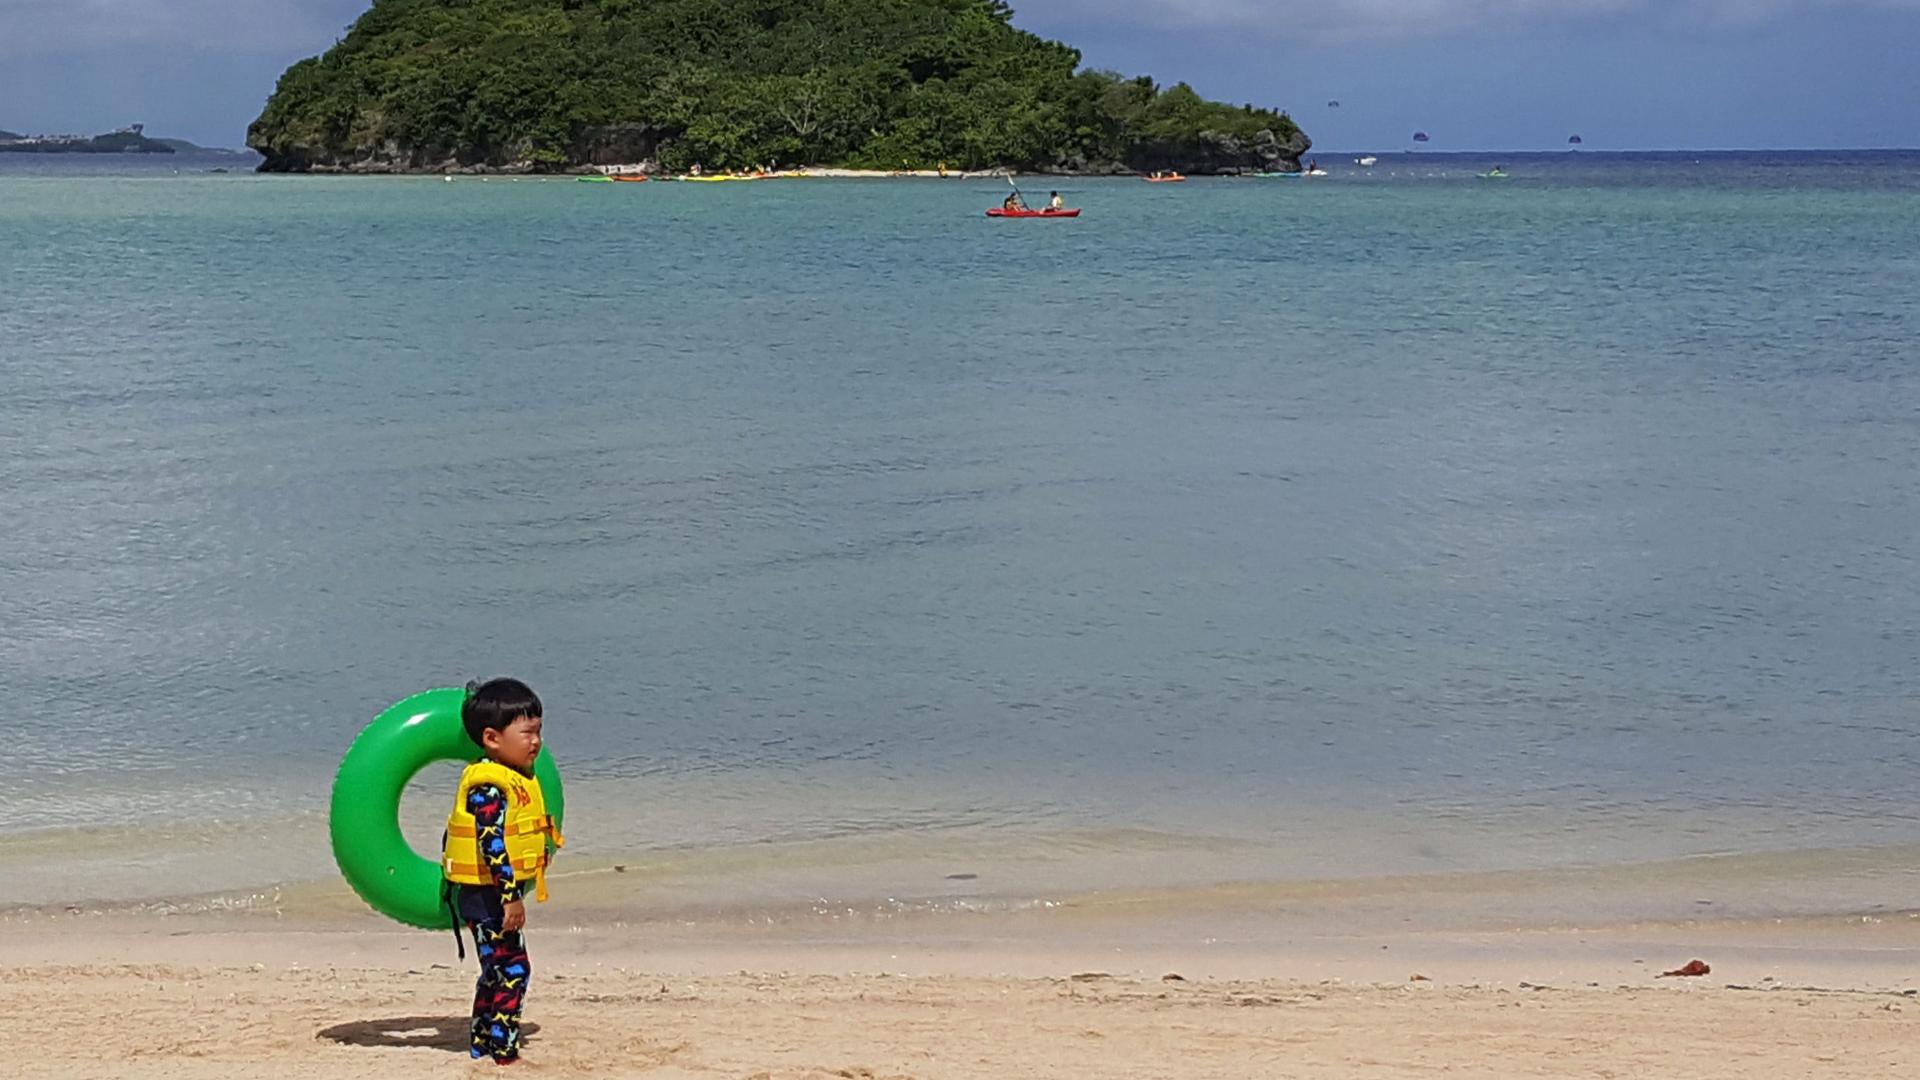 Why North Korea threatened Guam, the tiny U.S. territory with big military power